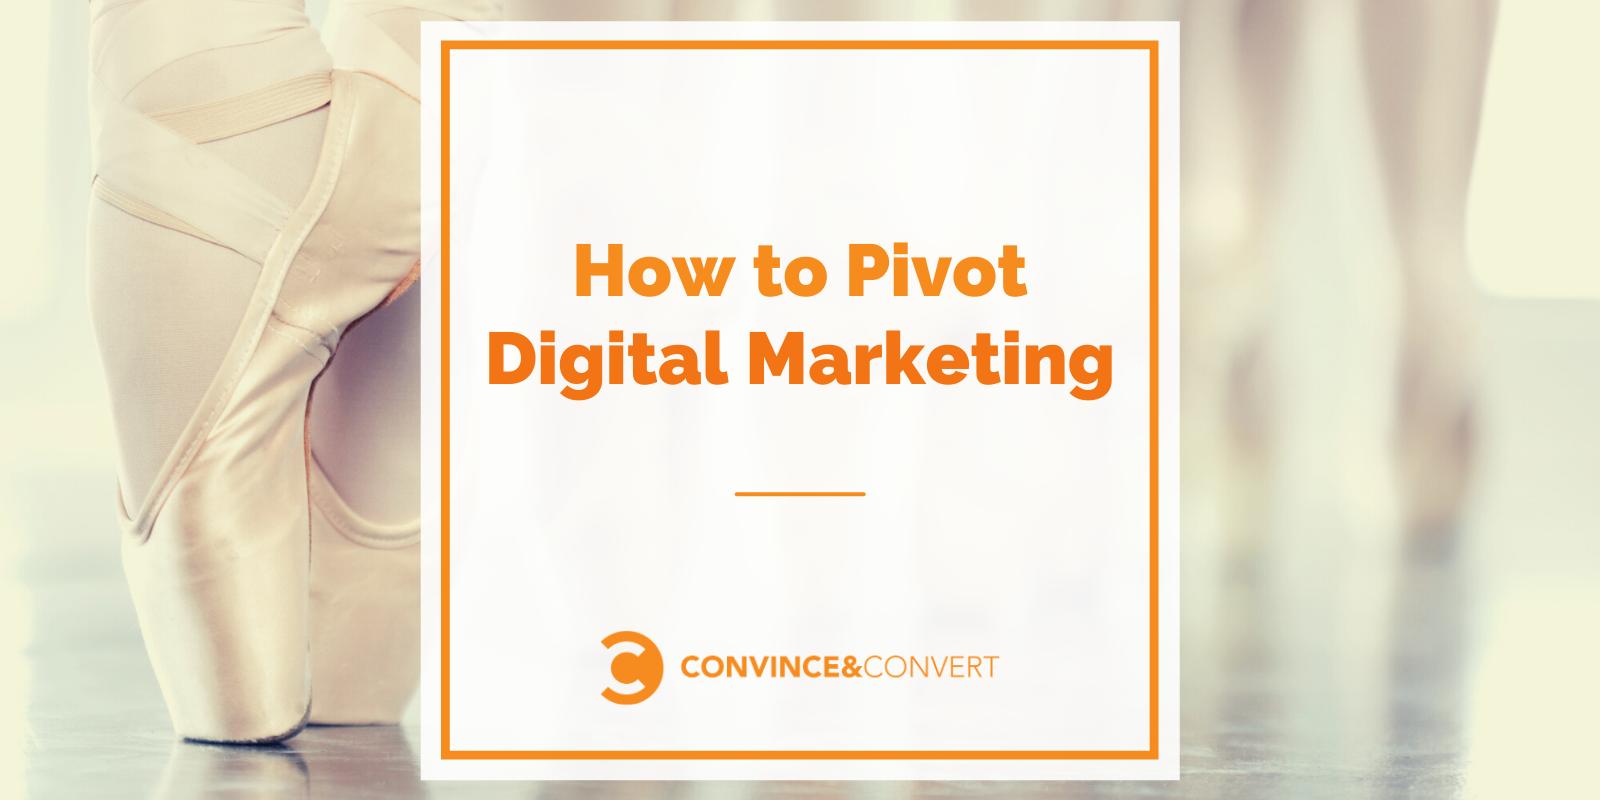 How to Pivot Digital Marketing